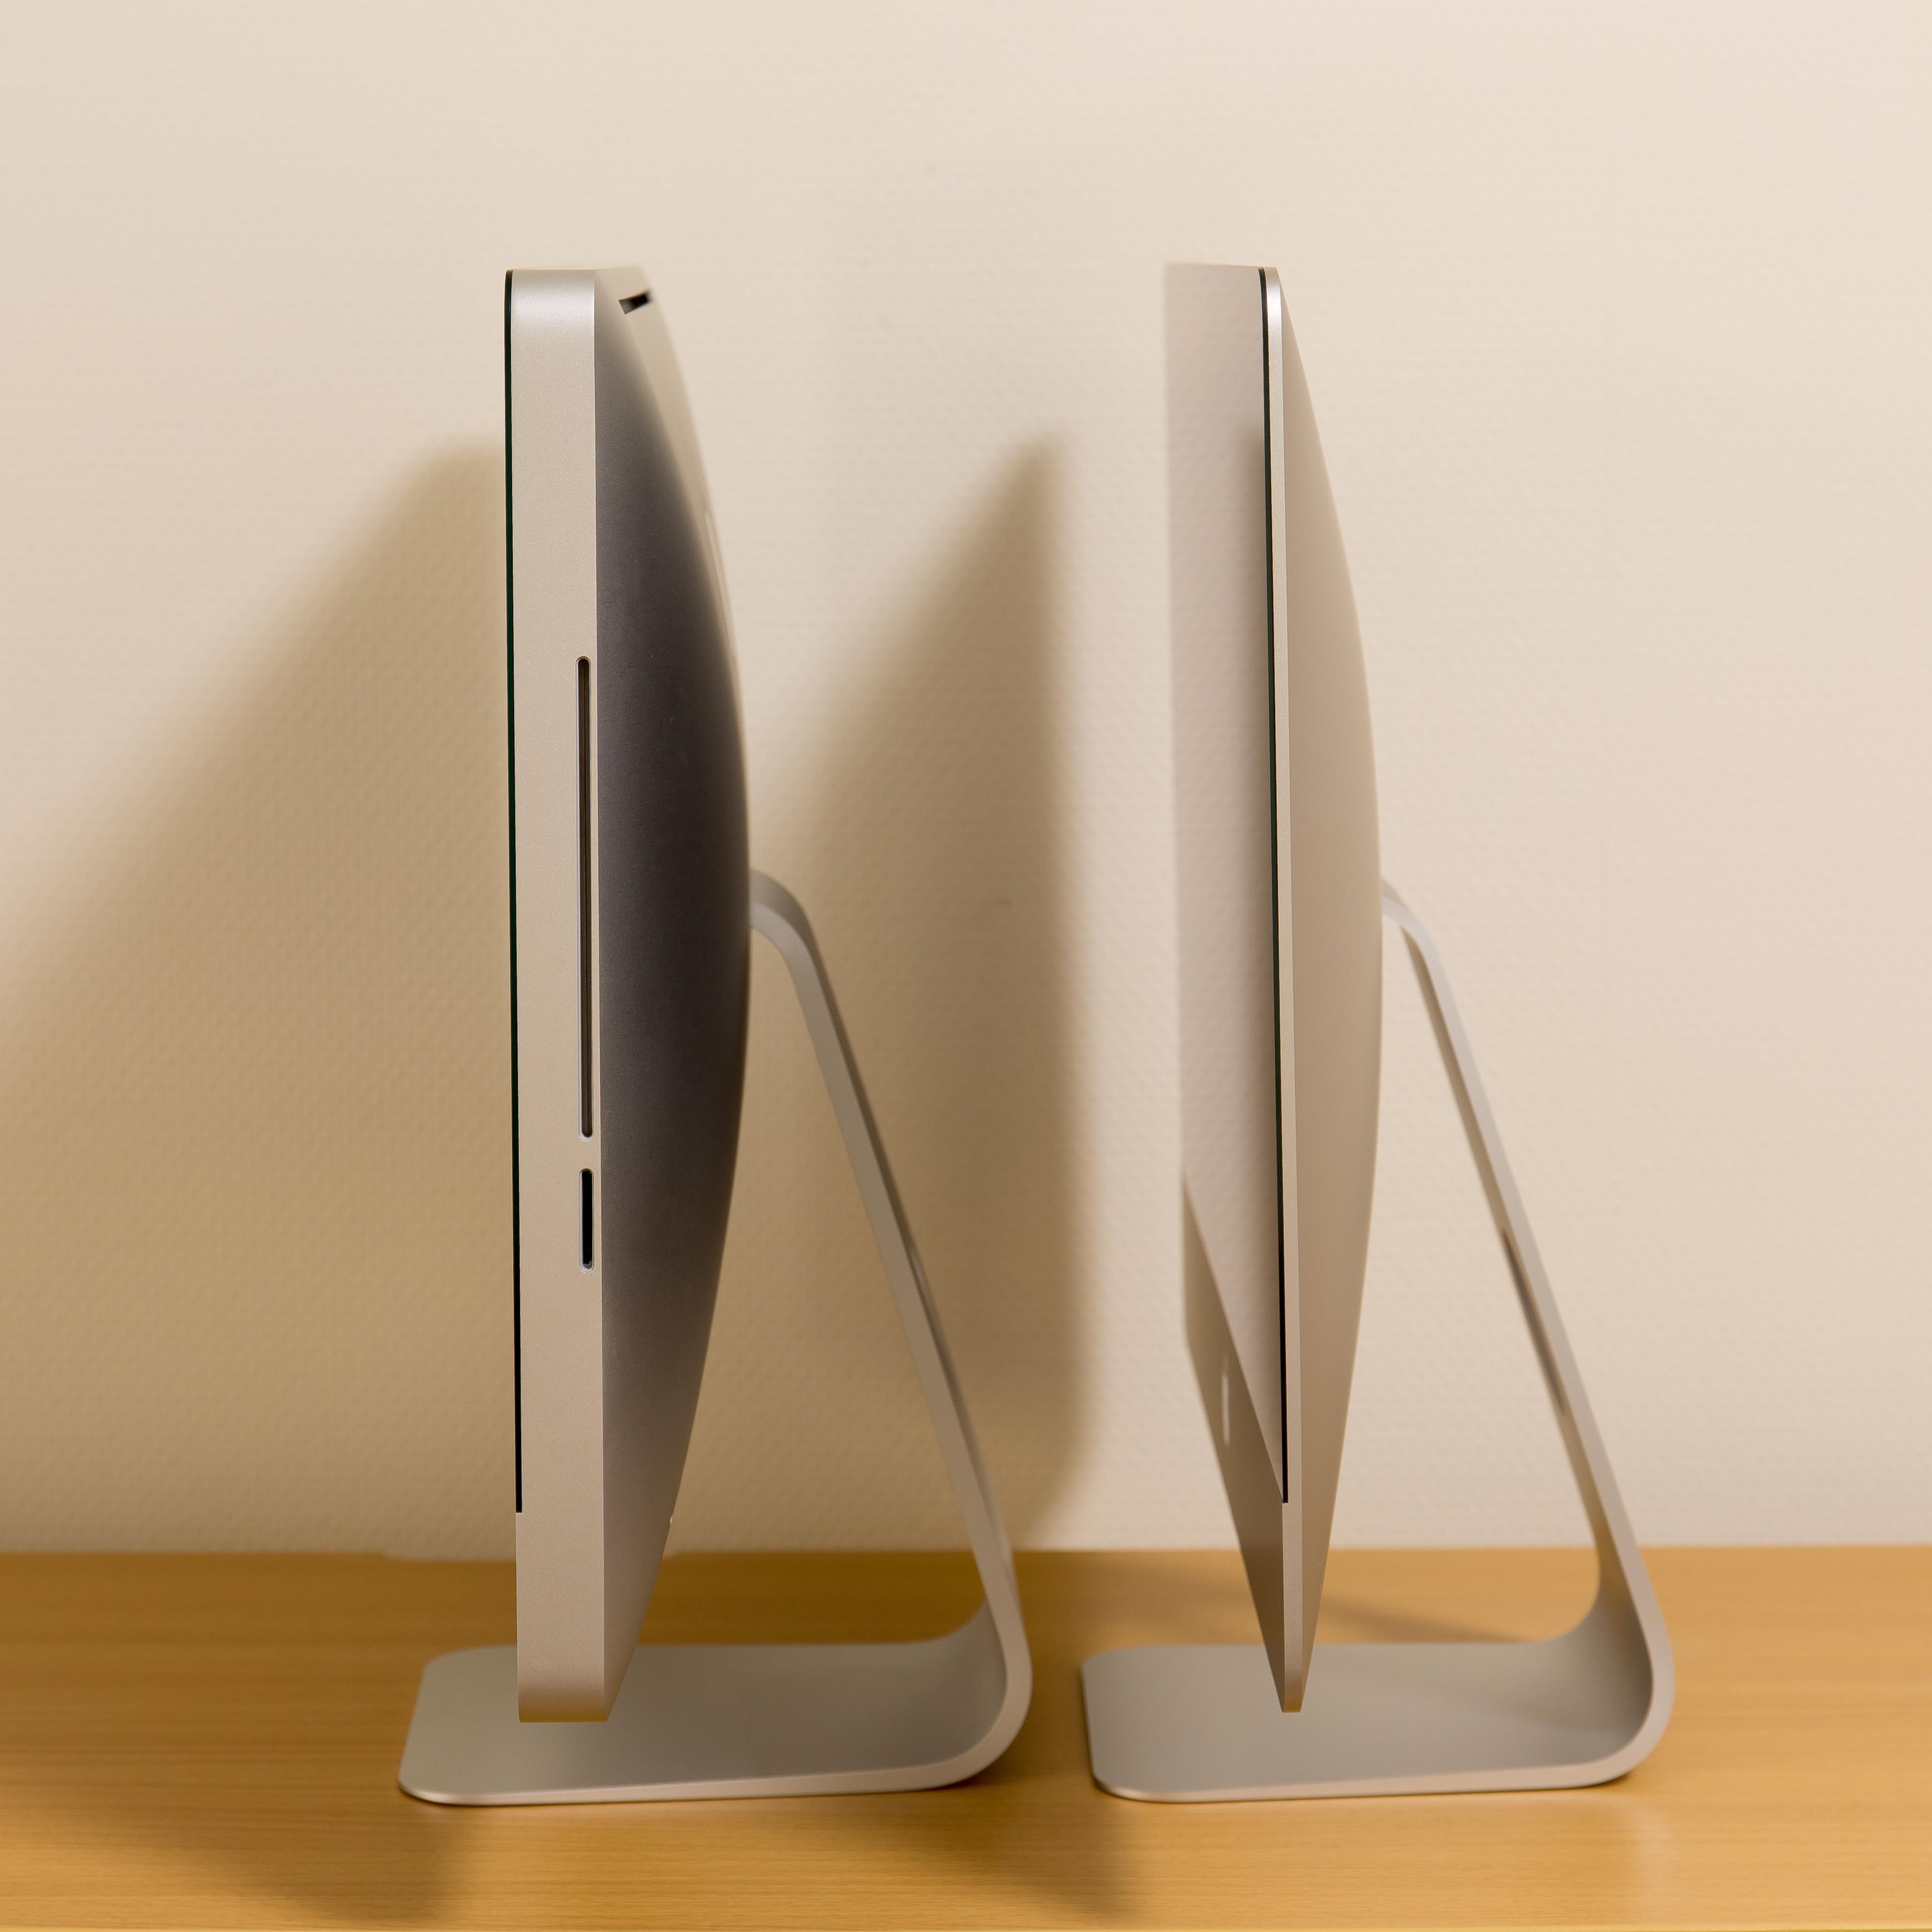 「iMac Retina 21.5インチ」購入(5)